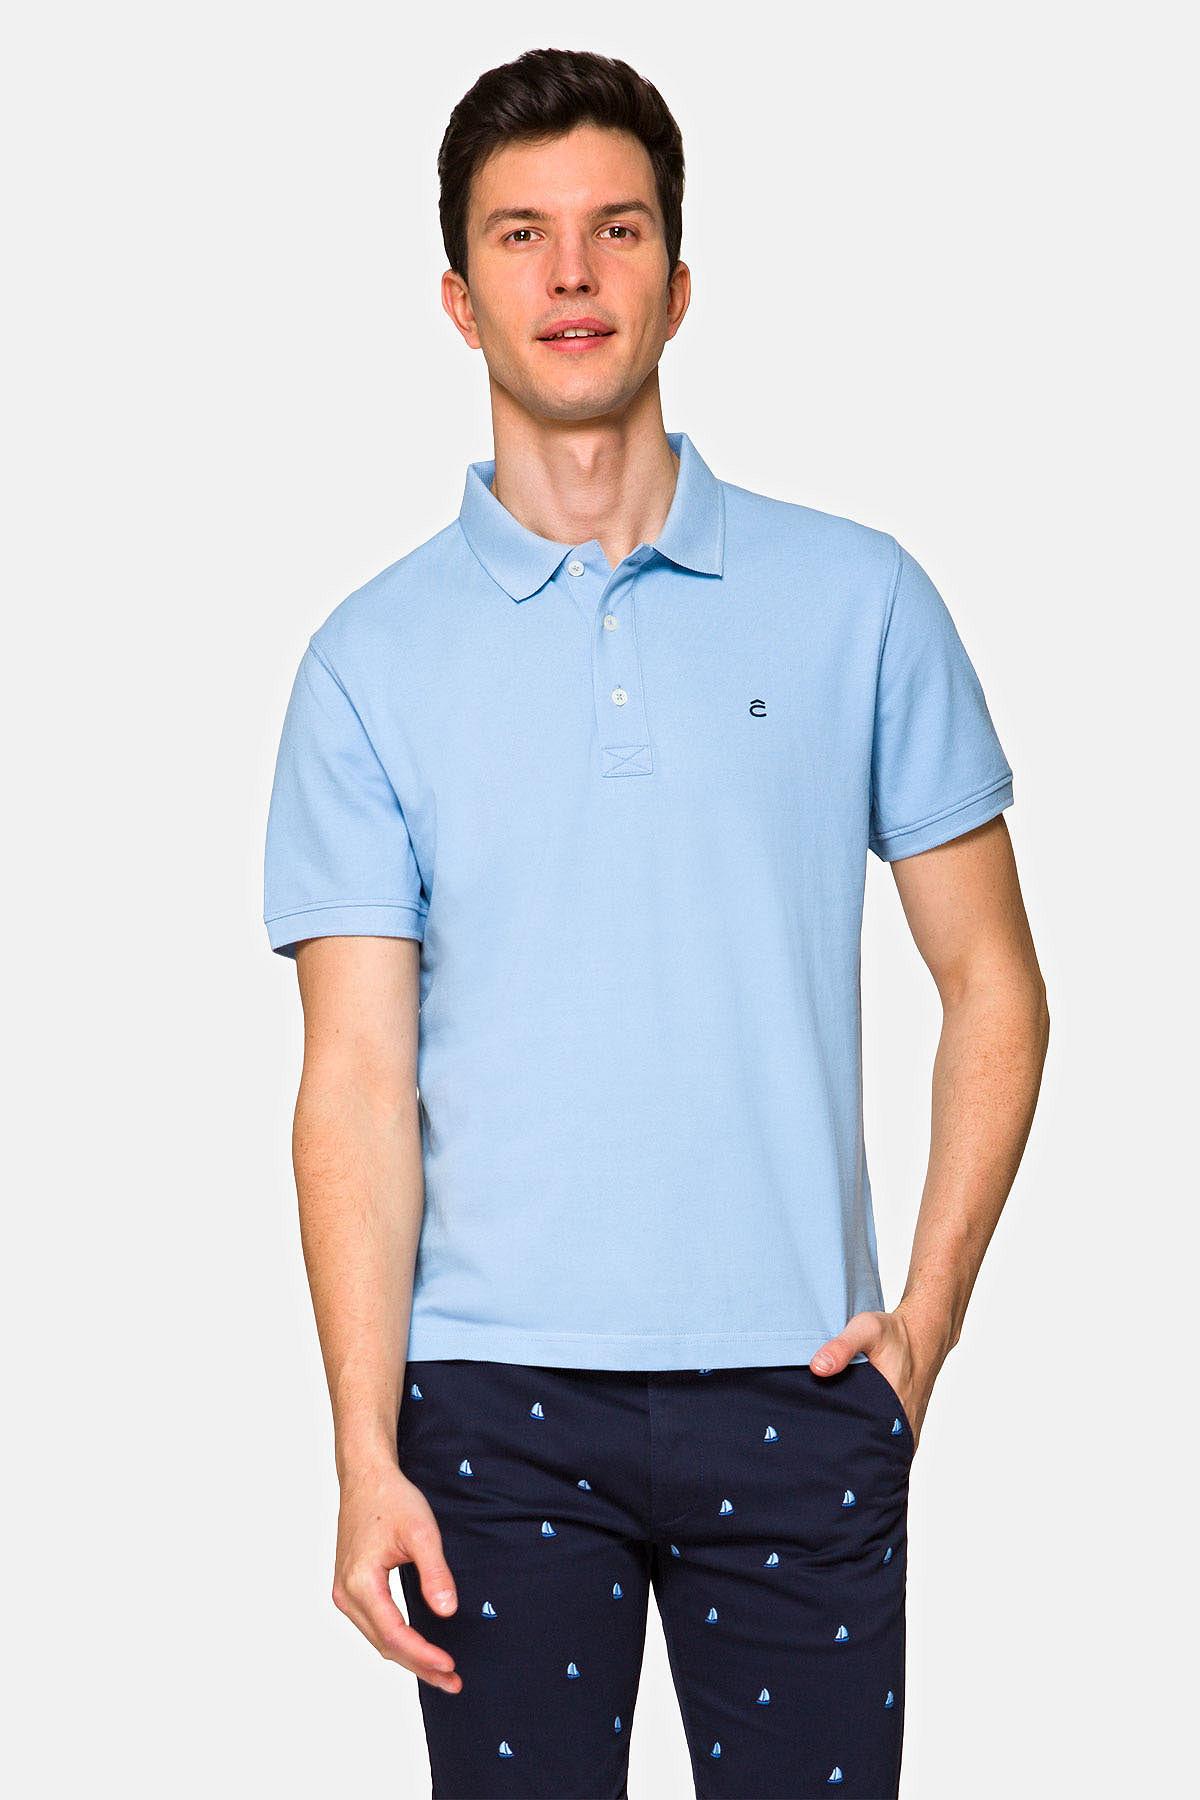 Koszulka Jasnoniebieska Polo Patrick rozmiar 2XL; 3XL; L; M; S; XL